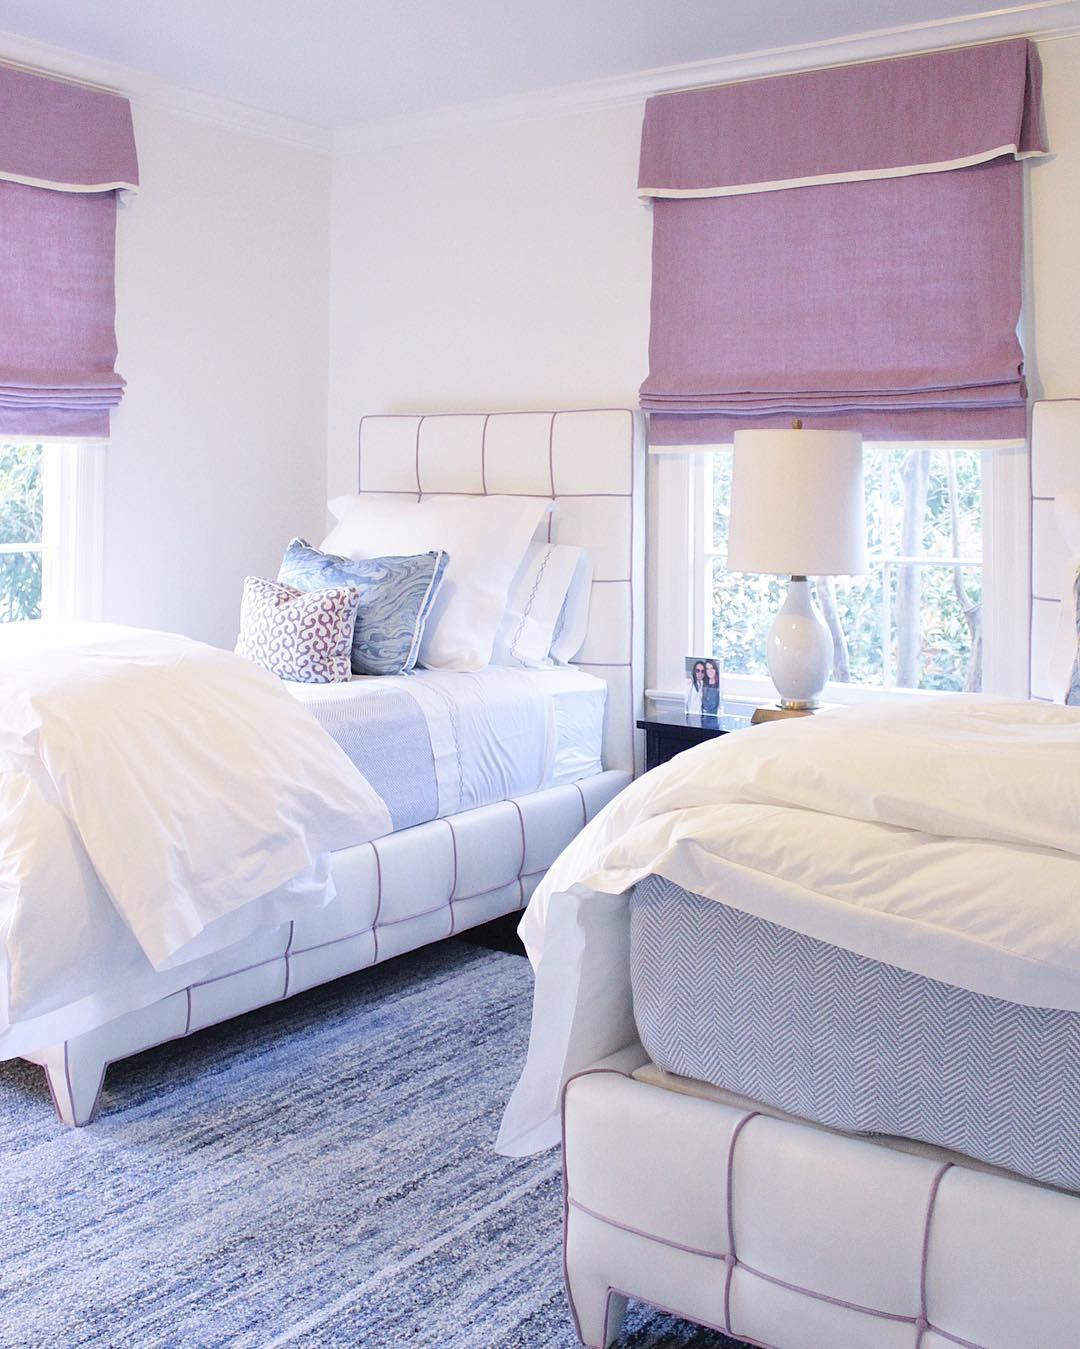 Bedroom Pretty Bedroom Design By California King Storage: Lavender Guest Bedroom Design By Collins Interiors